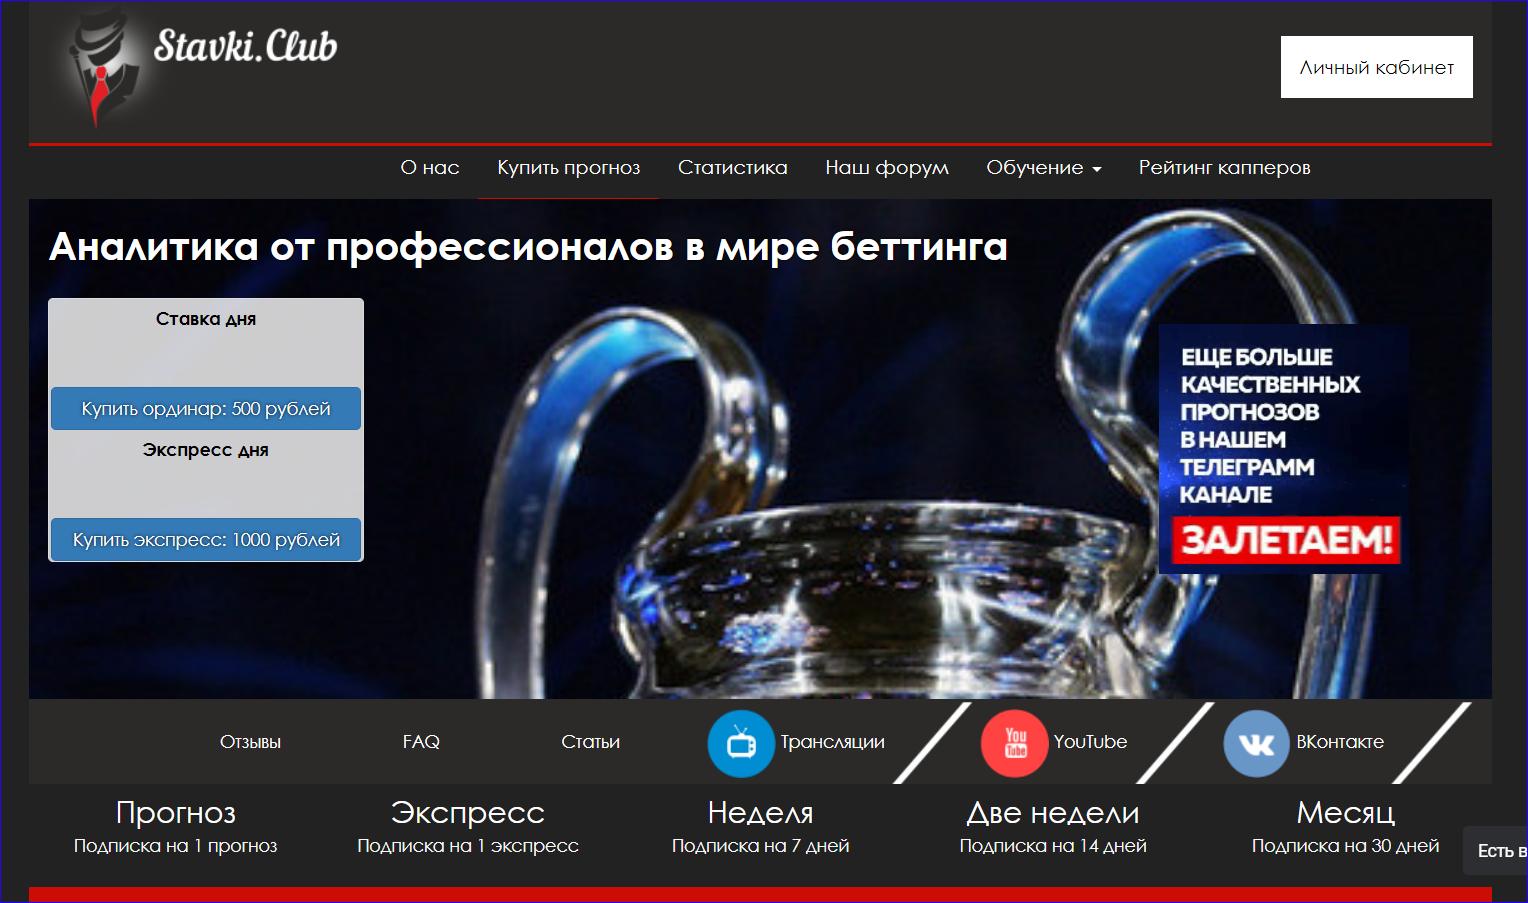 Сайт Stavki.Club